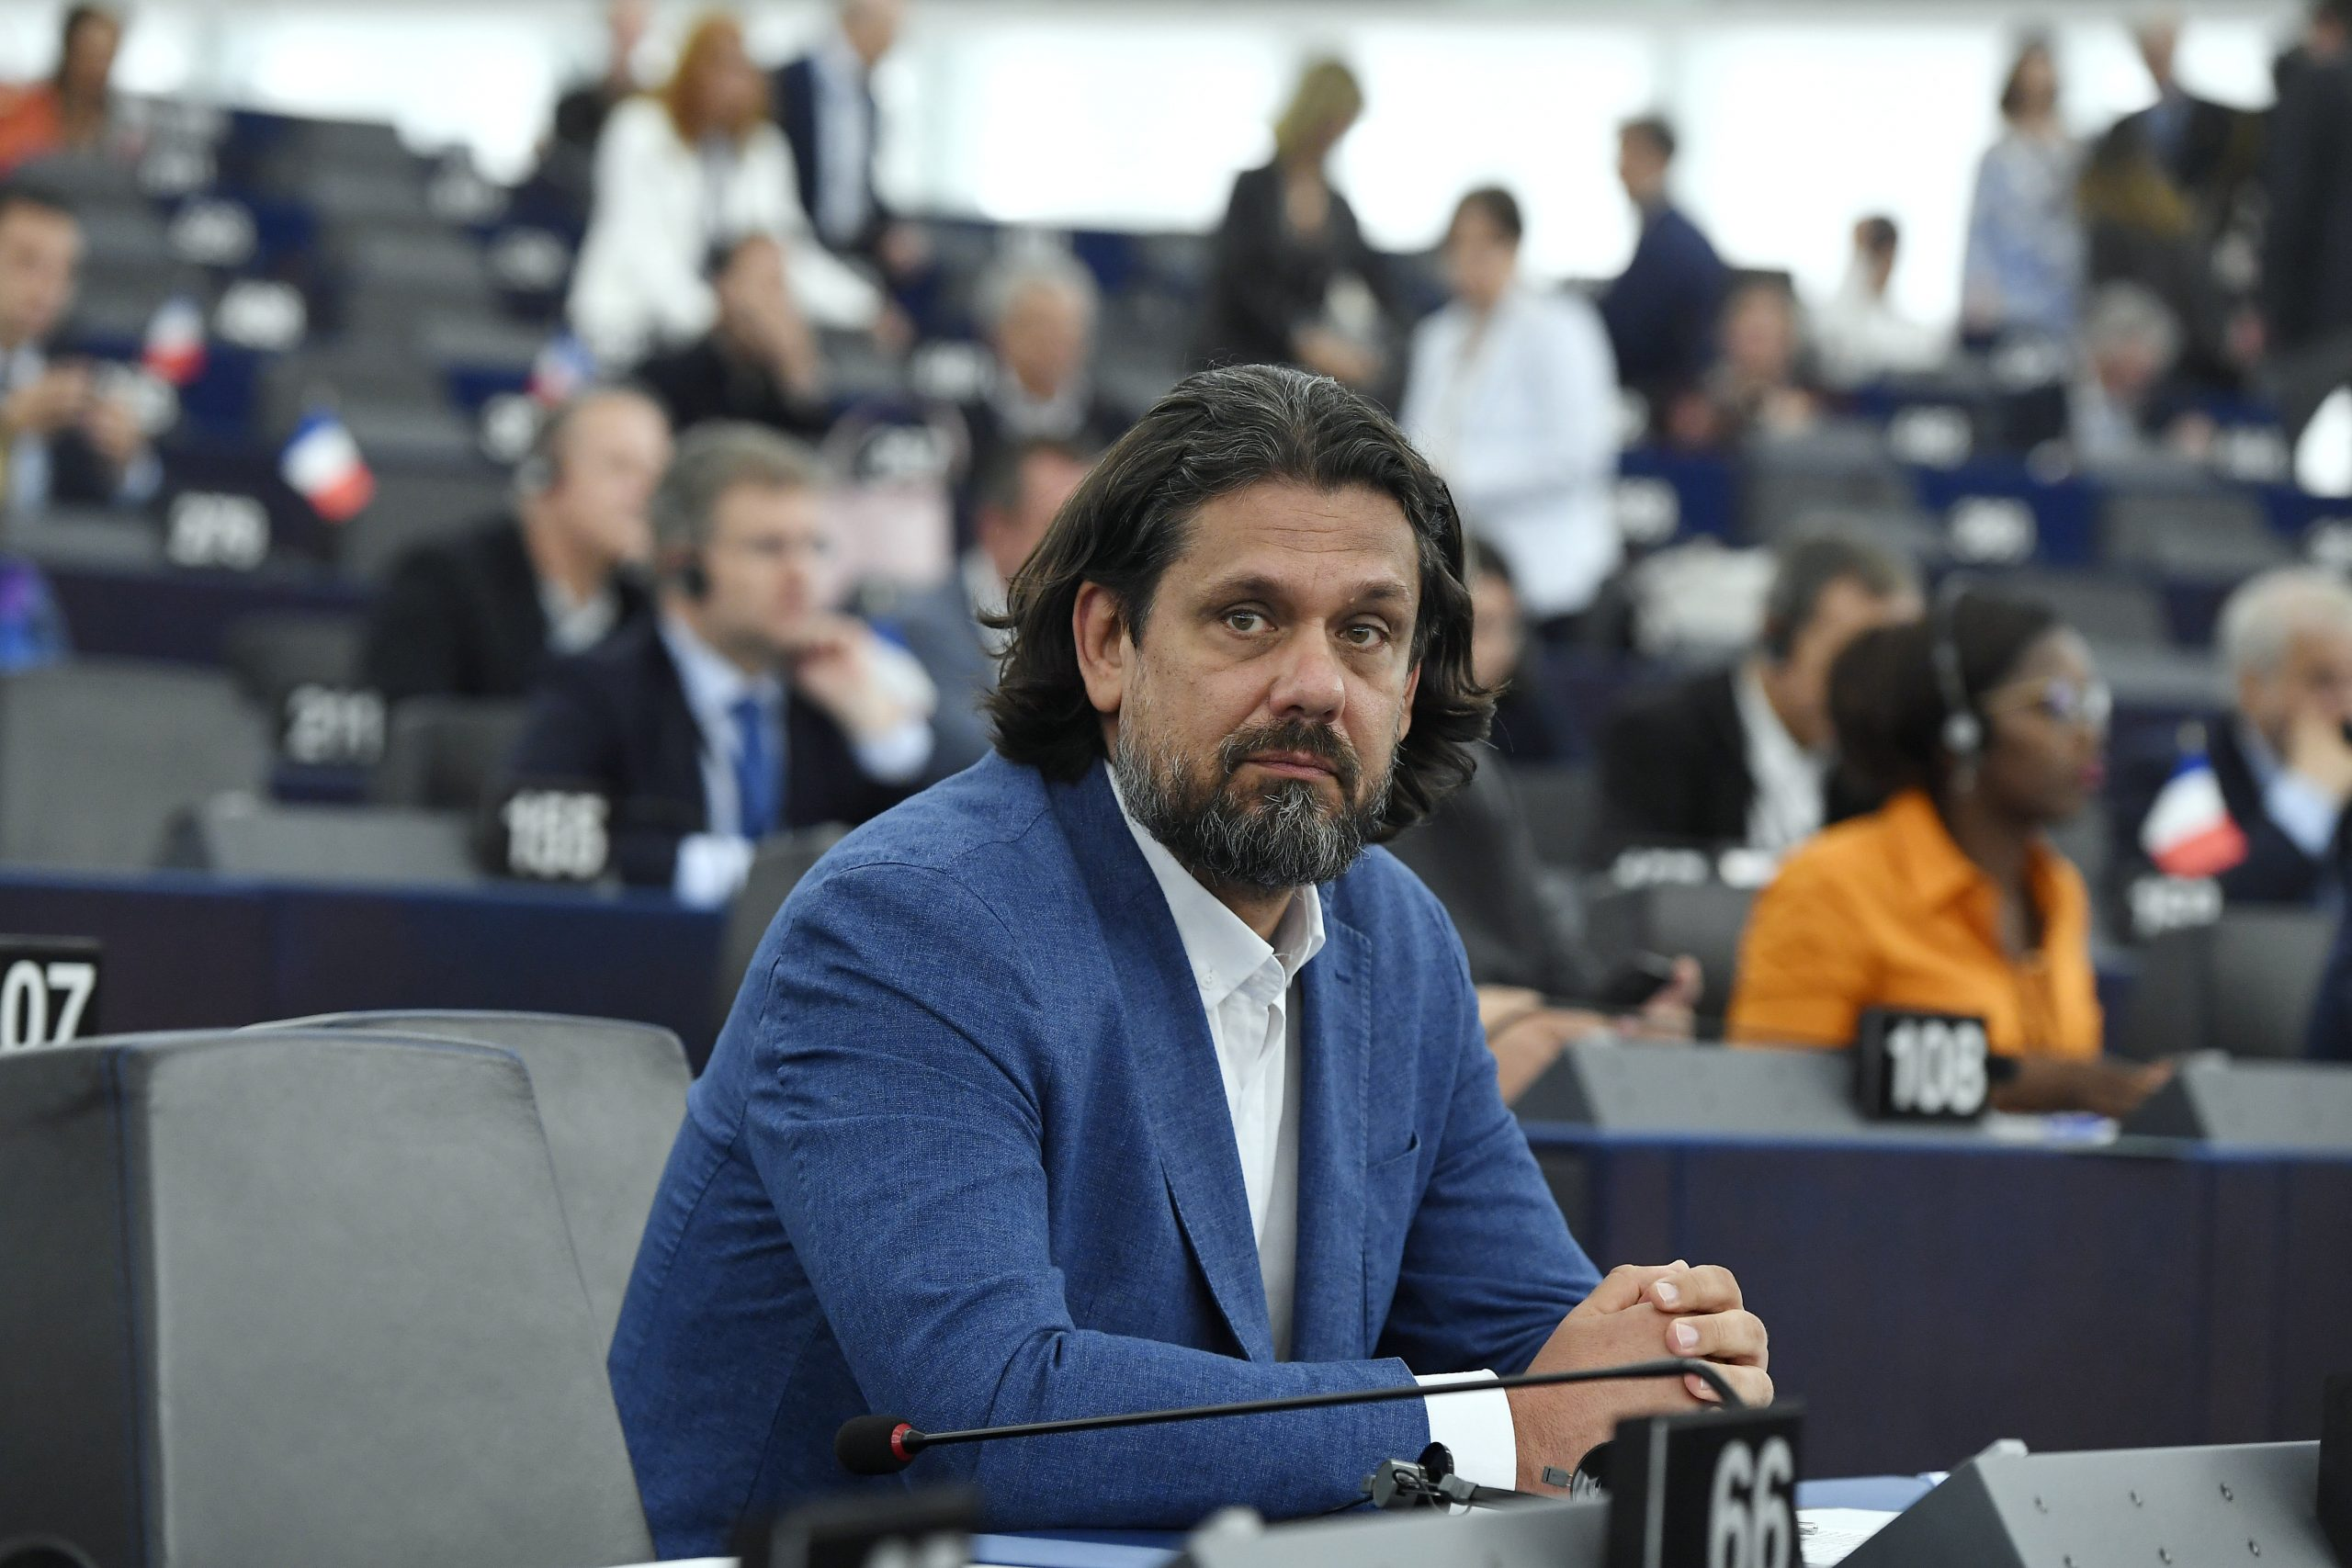 Fidesz MEP Deutsch Apologises to EPP for Harsh Criticism